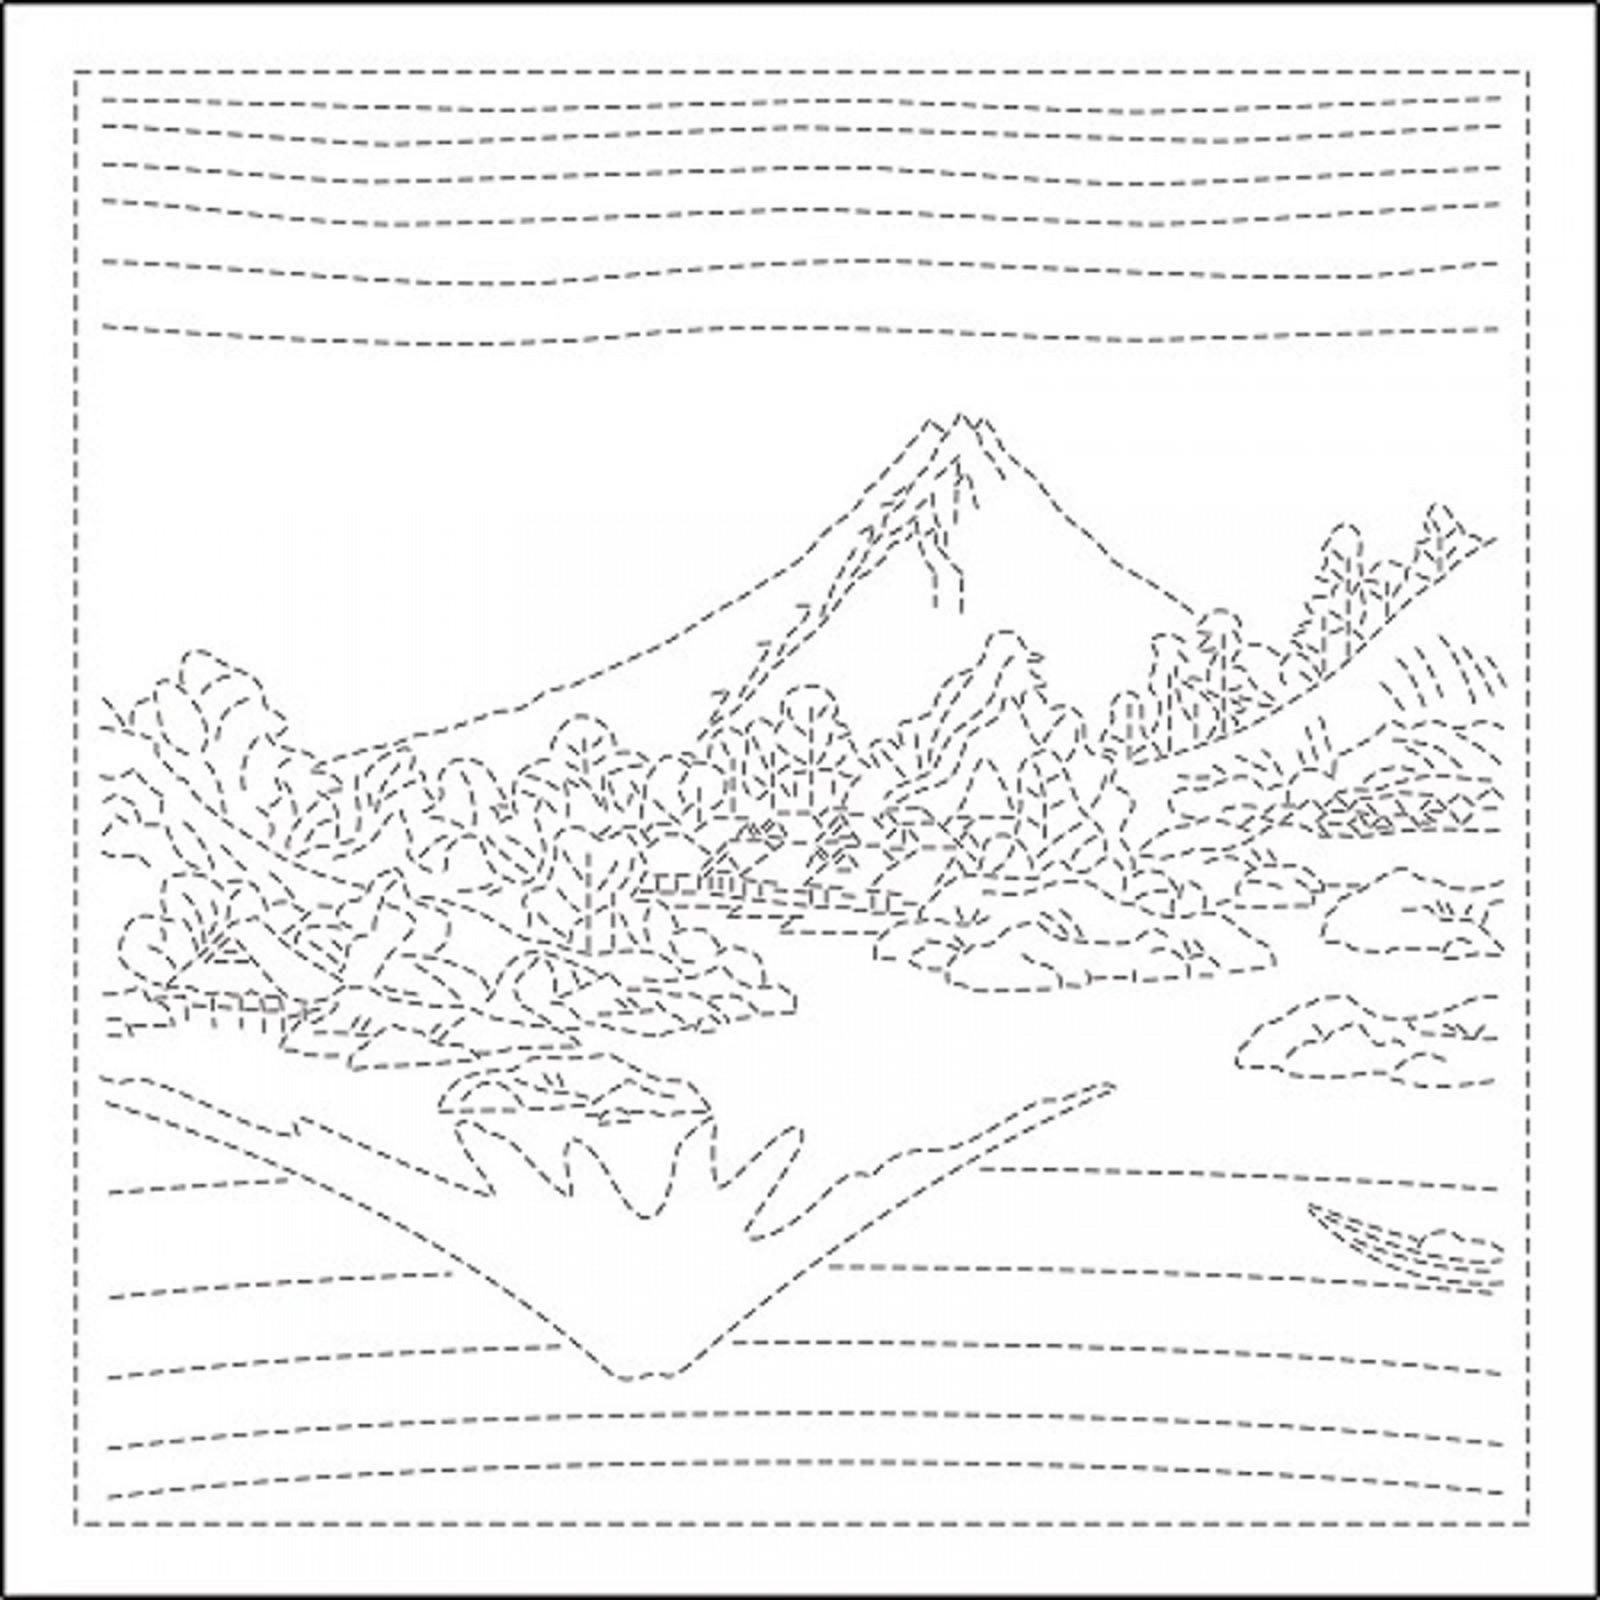 Hana Fukin Mt Fuji Sashiko Sampler white